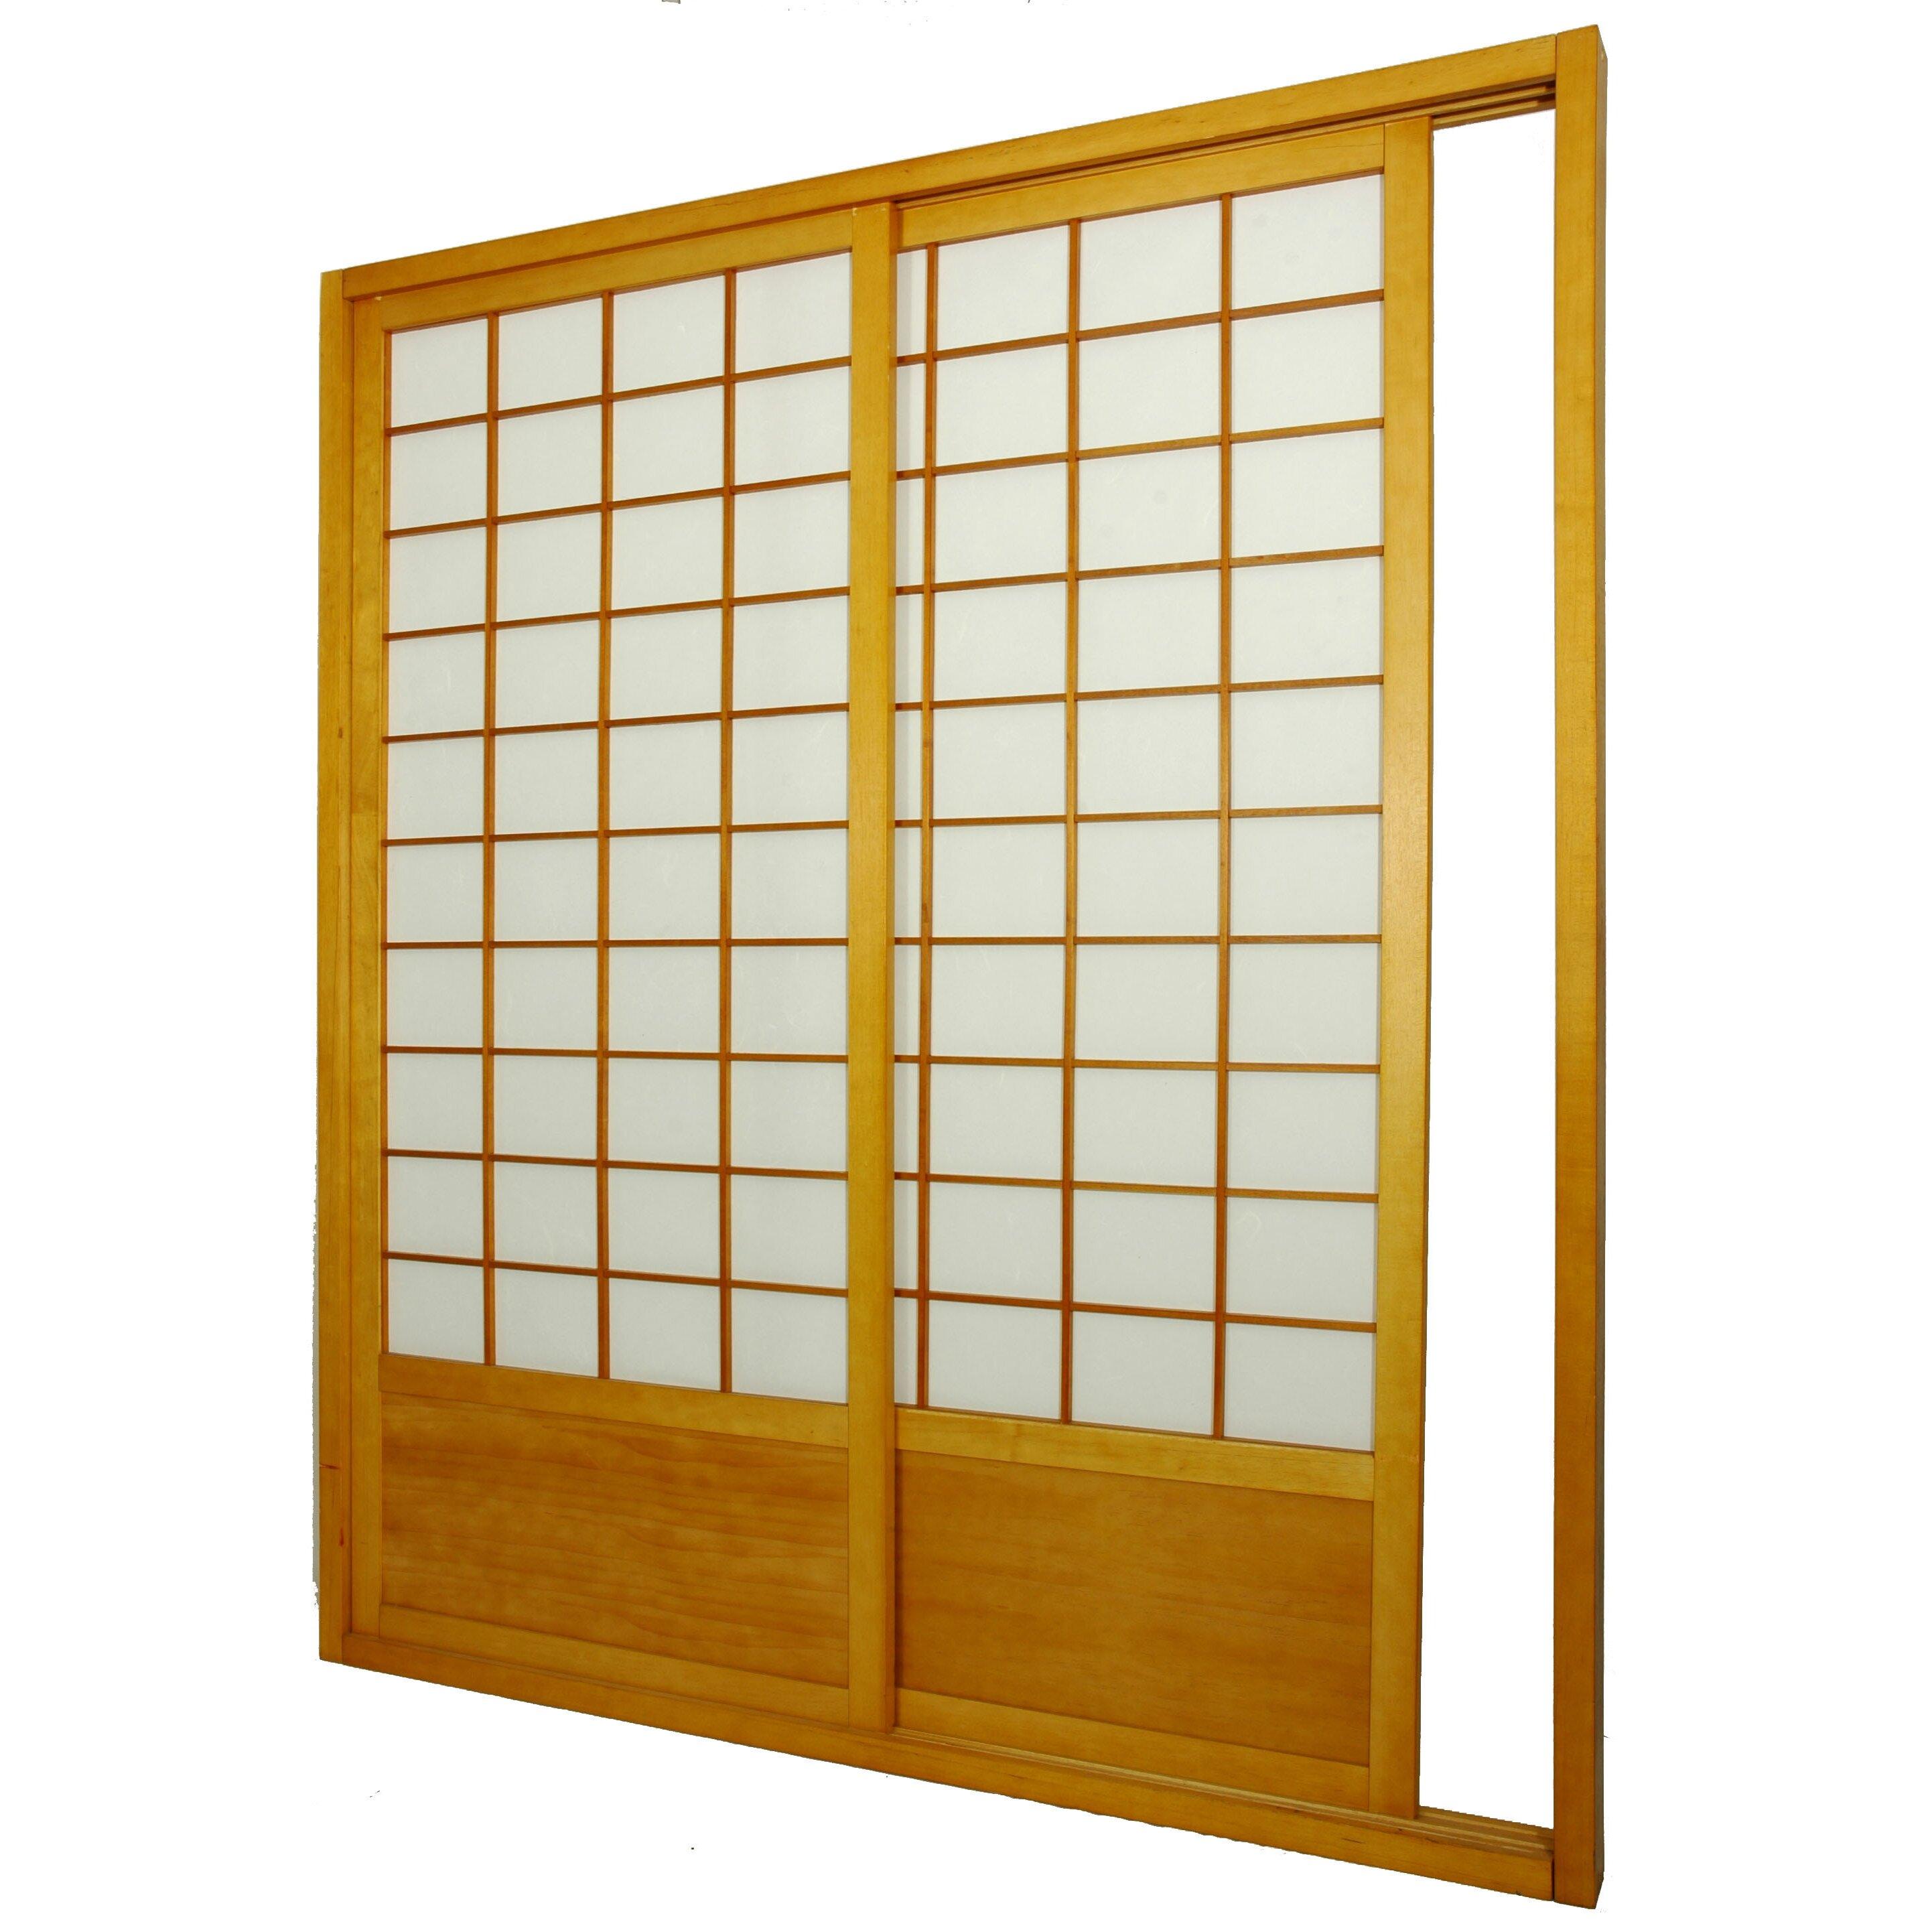 Oriental furniture 83 x 73 5 single sided sliding door shoji room divider reviews wayfair - Shoji room divider ...